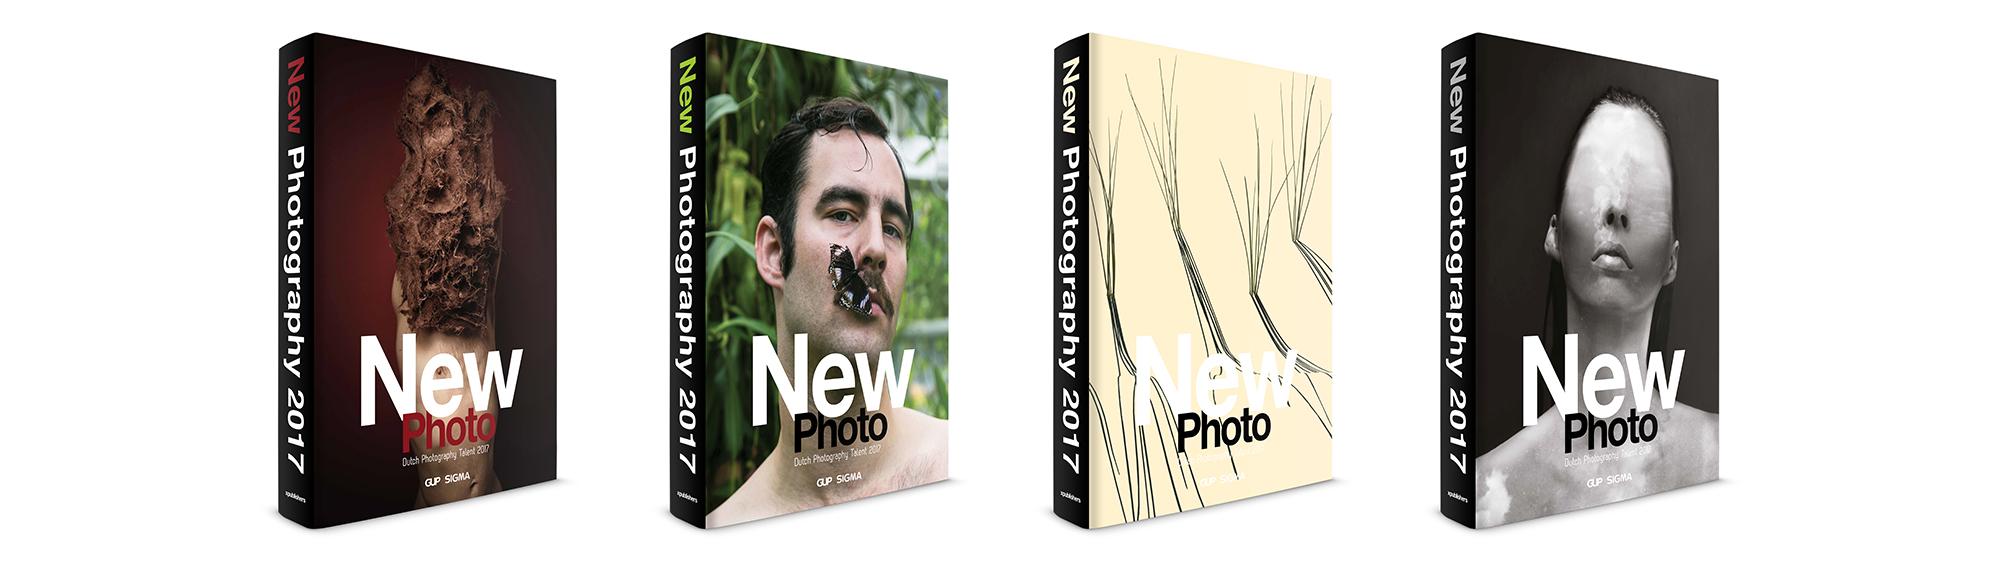 Introduction by Peggy Kuiper  Cover images © Brett Meredith / Inta Nahapetjan /Jelle Rietveld/ Petra Katanic